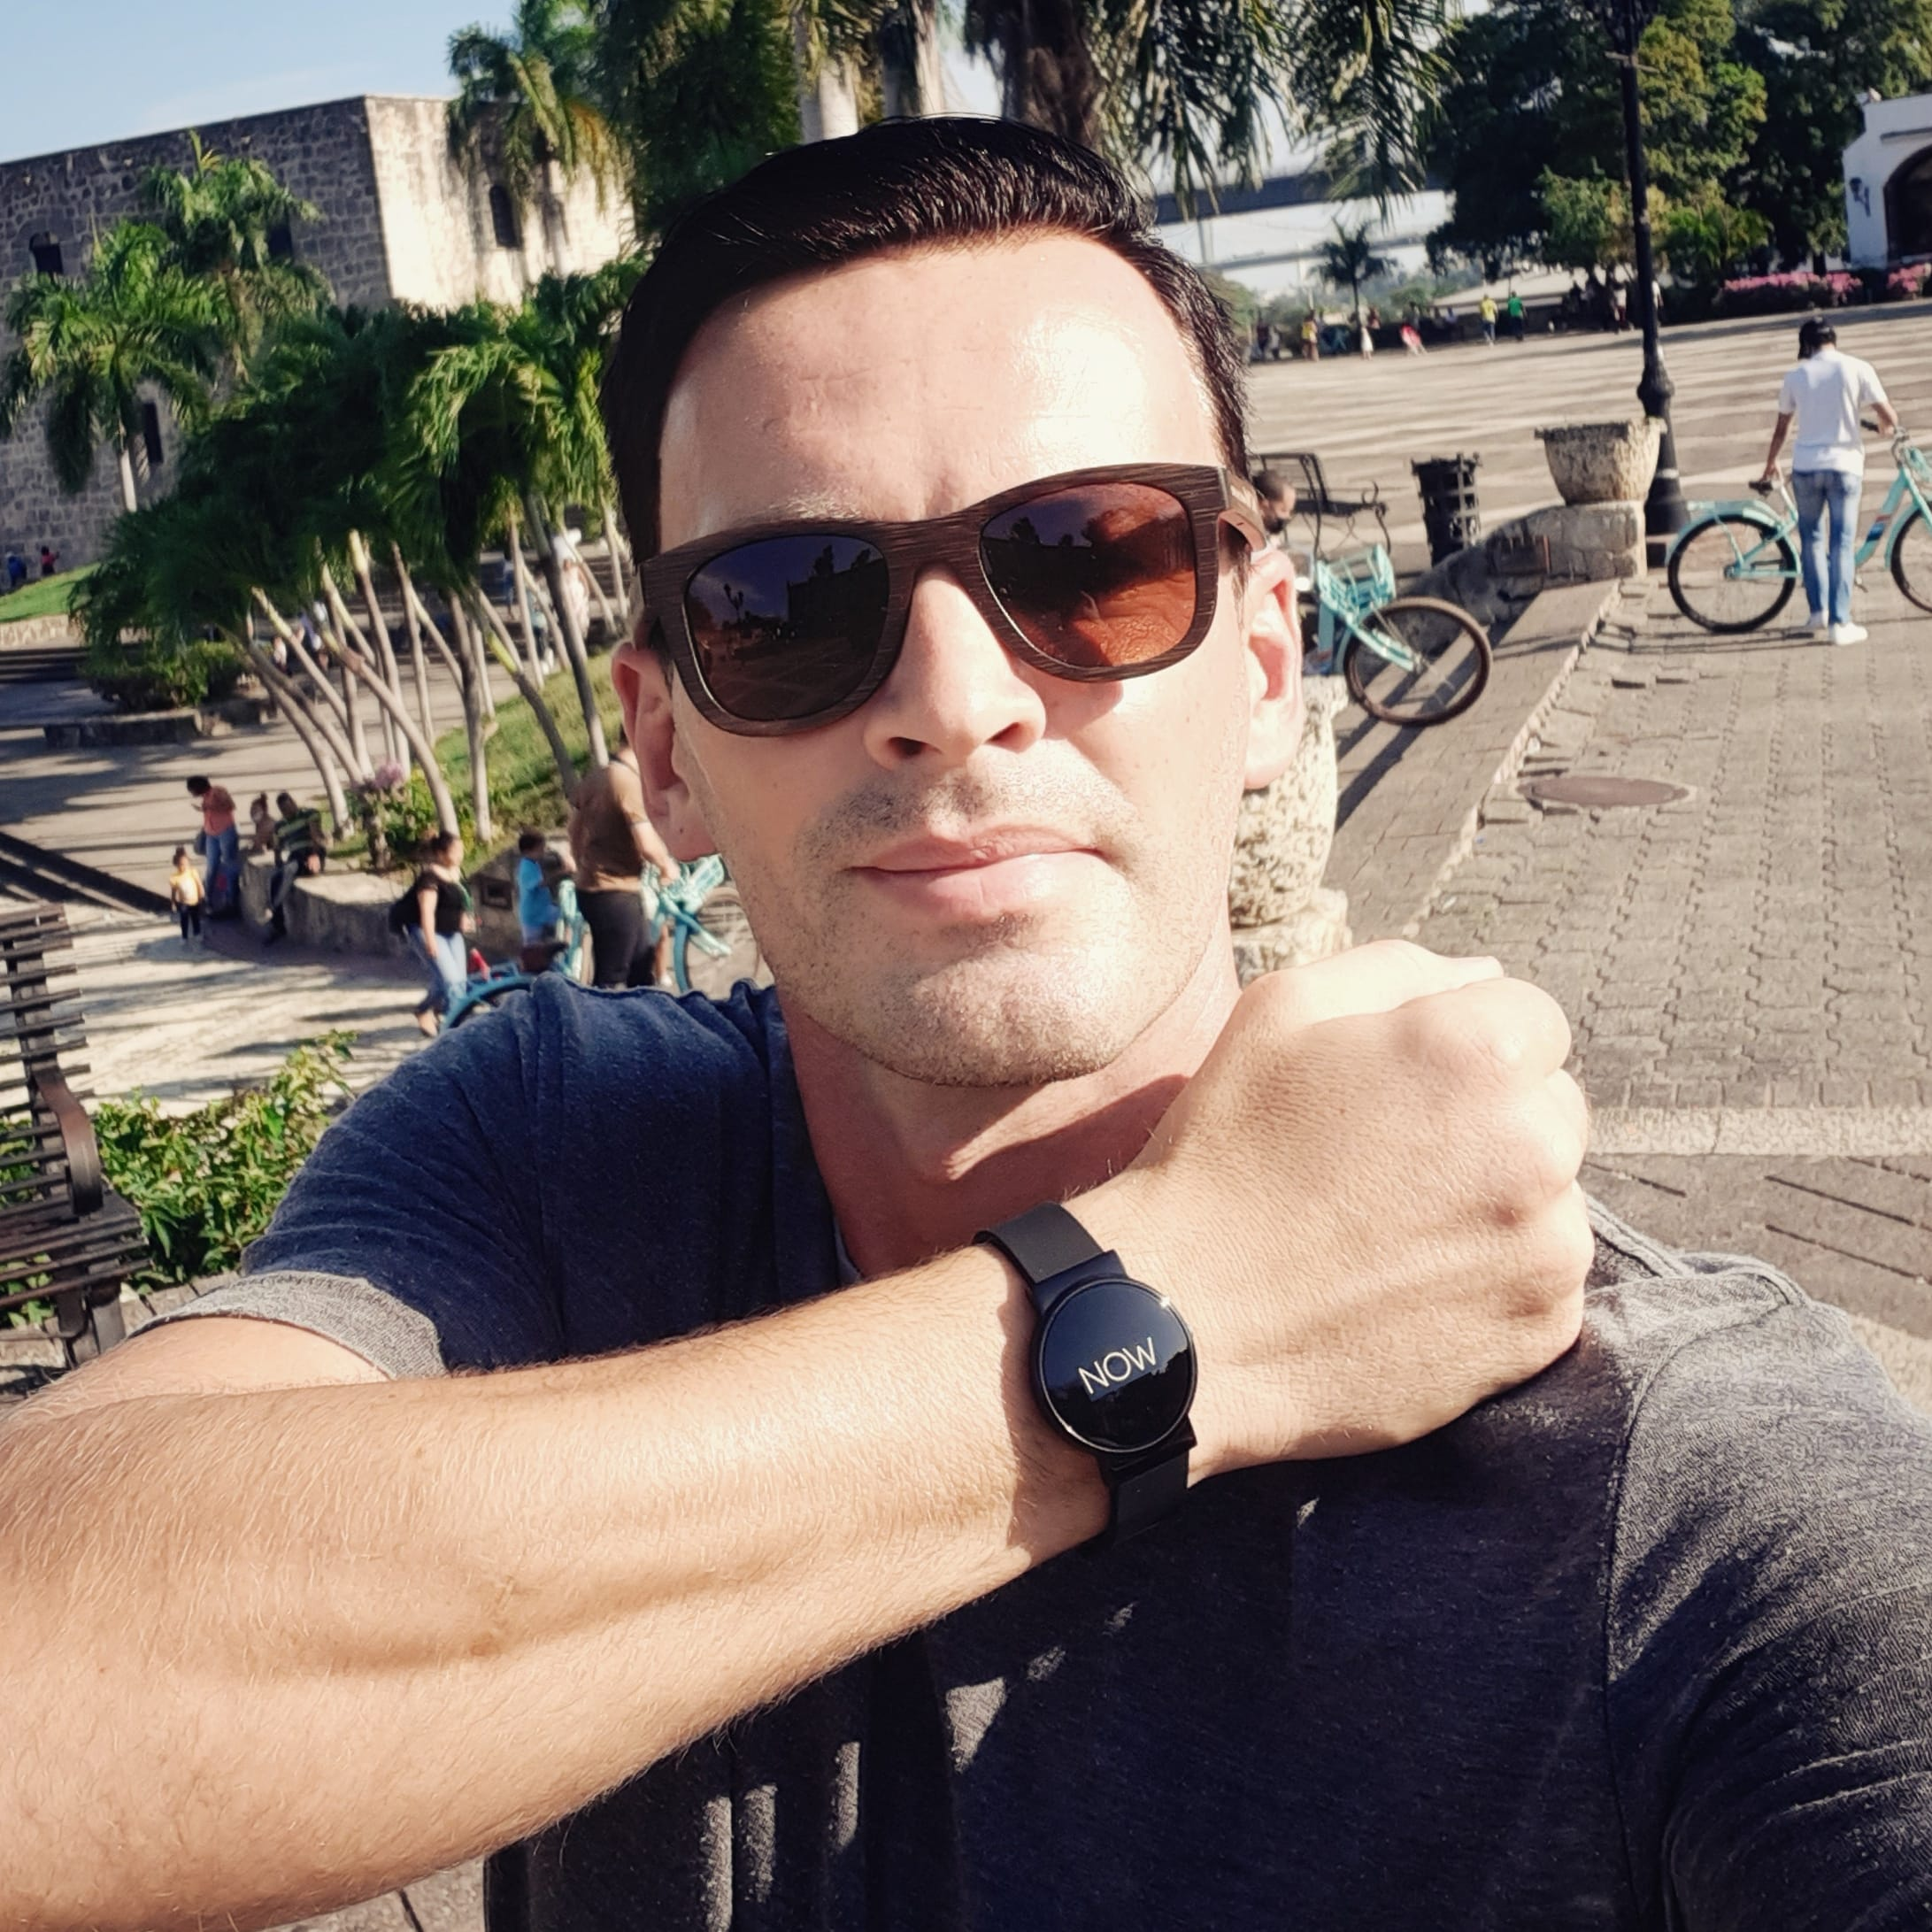 Greg NOW Watch Website Founder